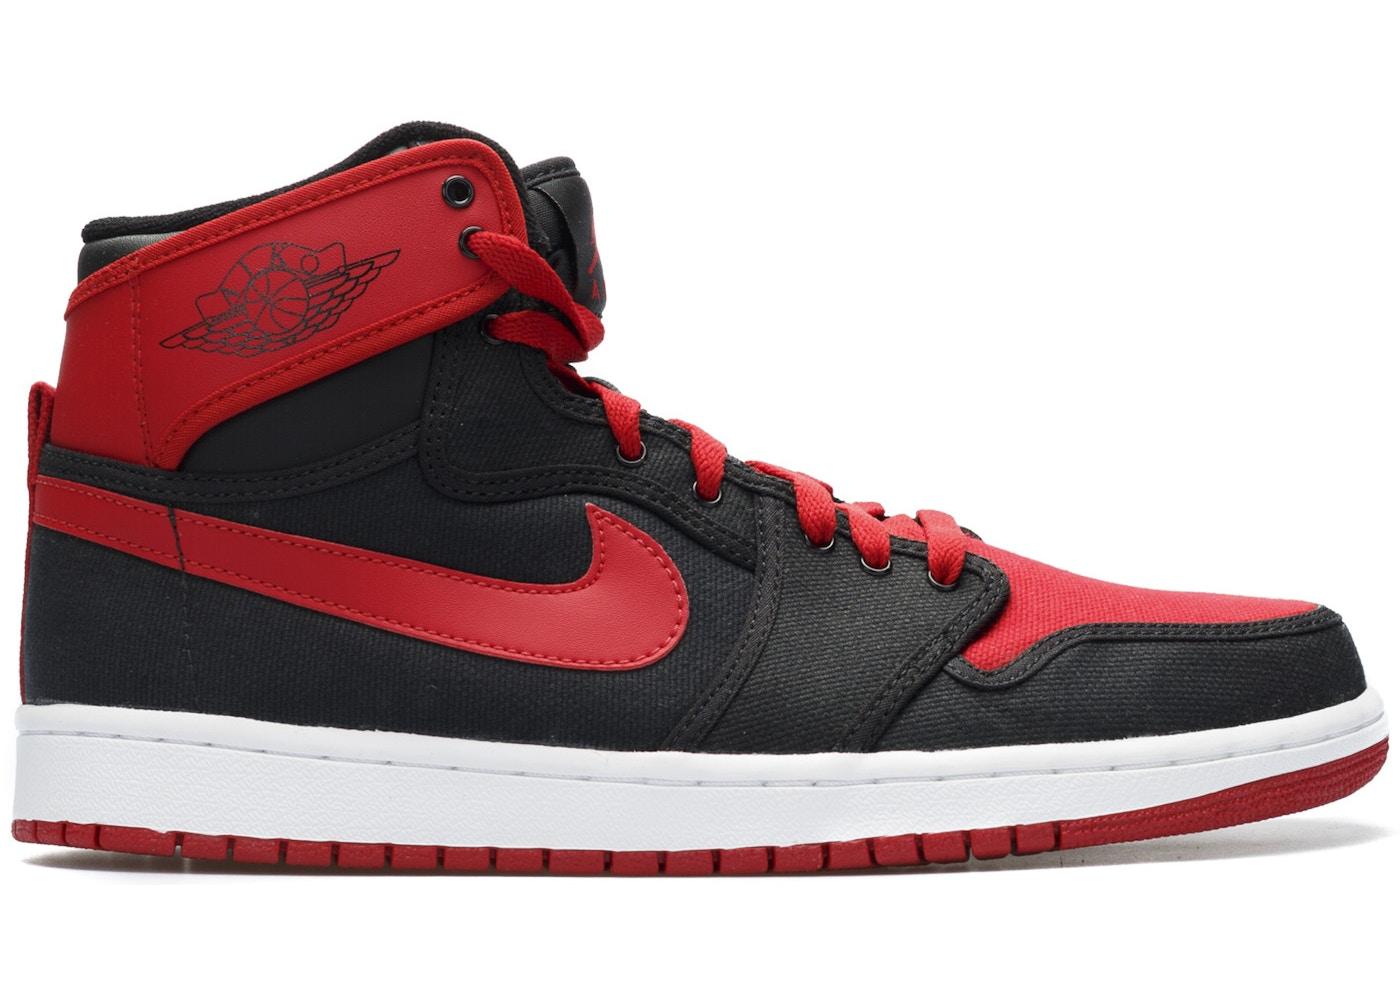 001a0ddb80751c Jordan 1 Retro KO High Bred (2012) - 402297-001